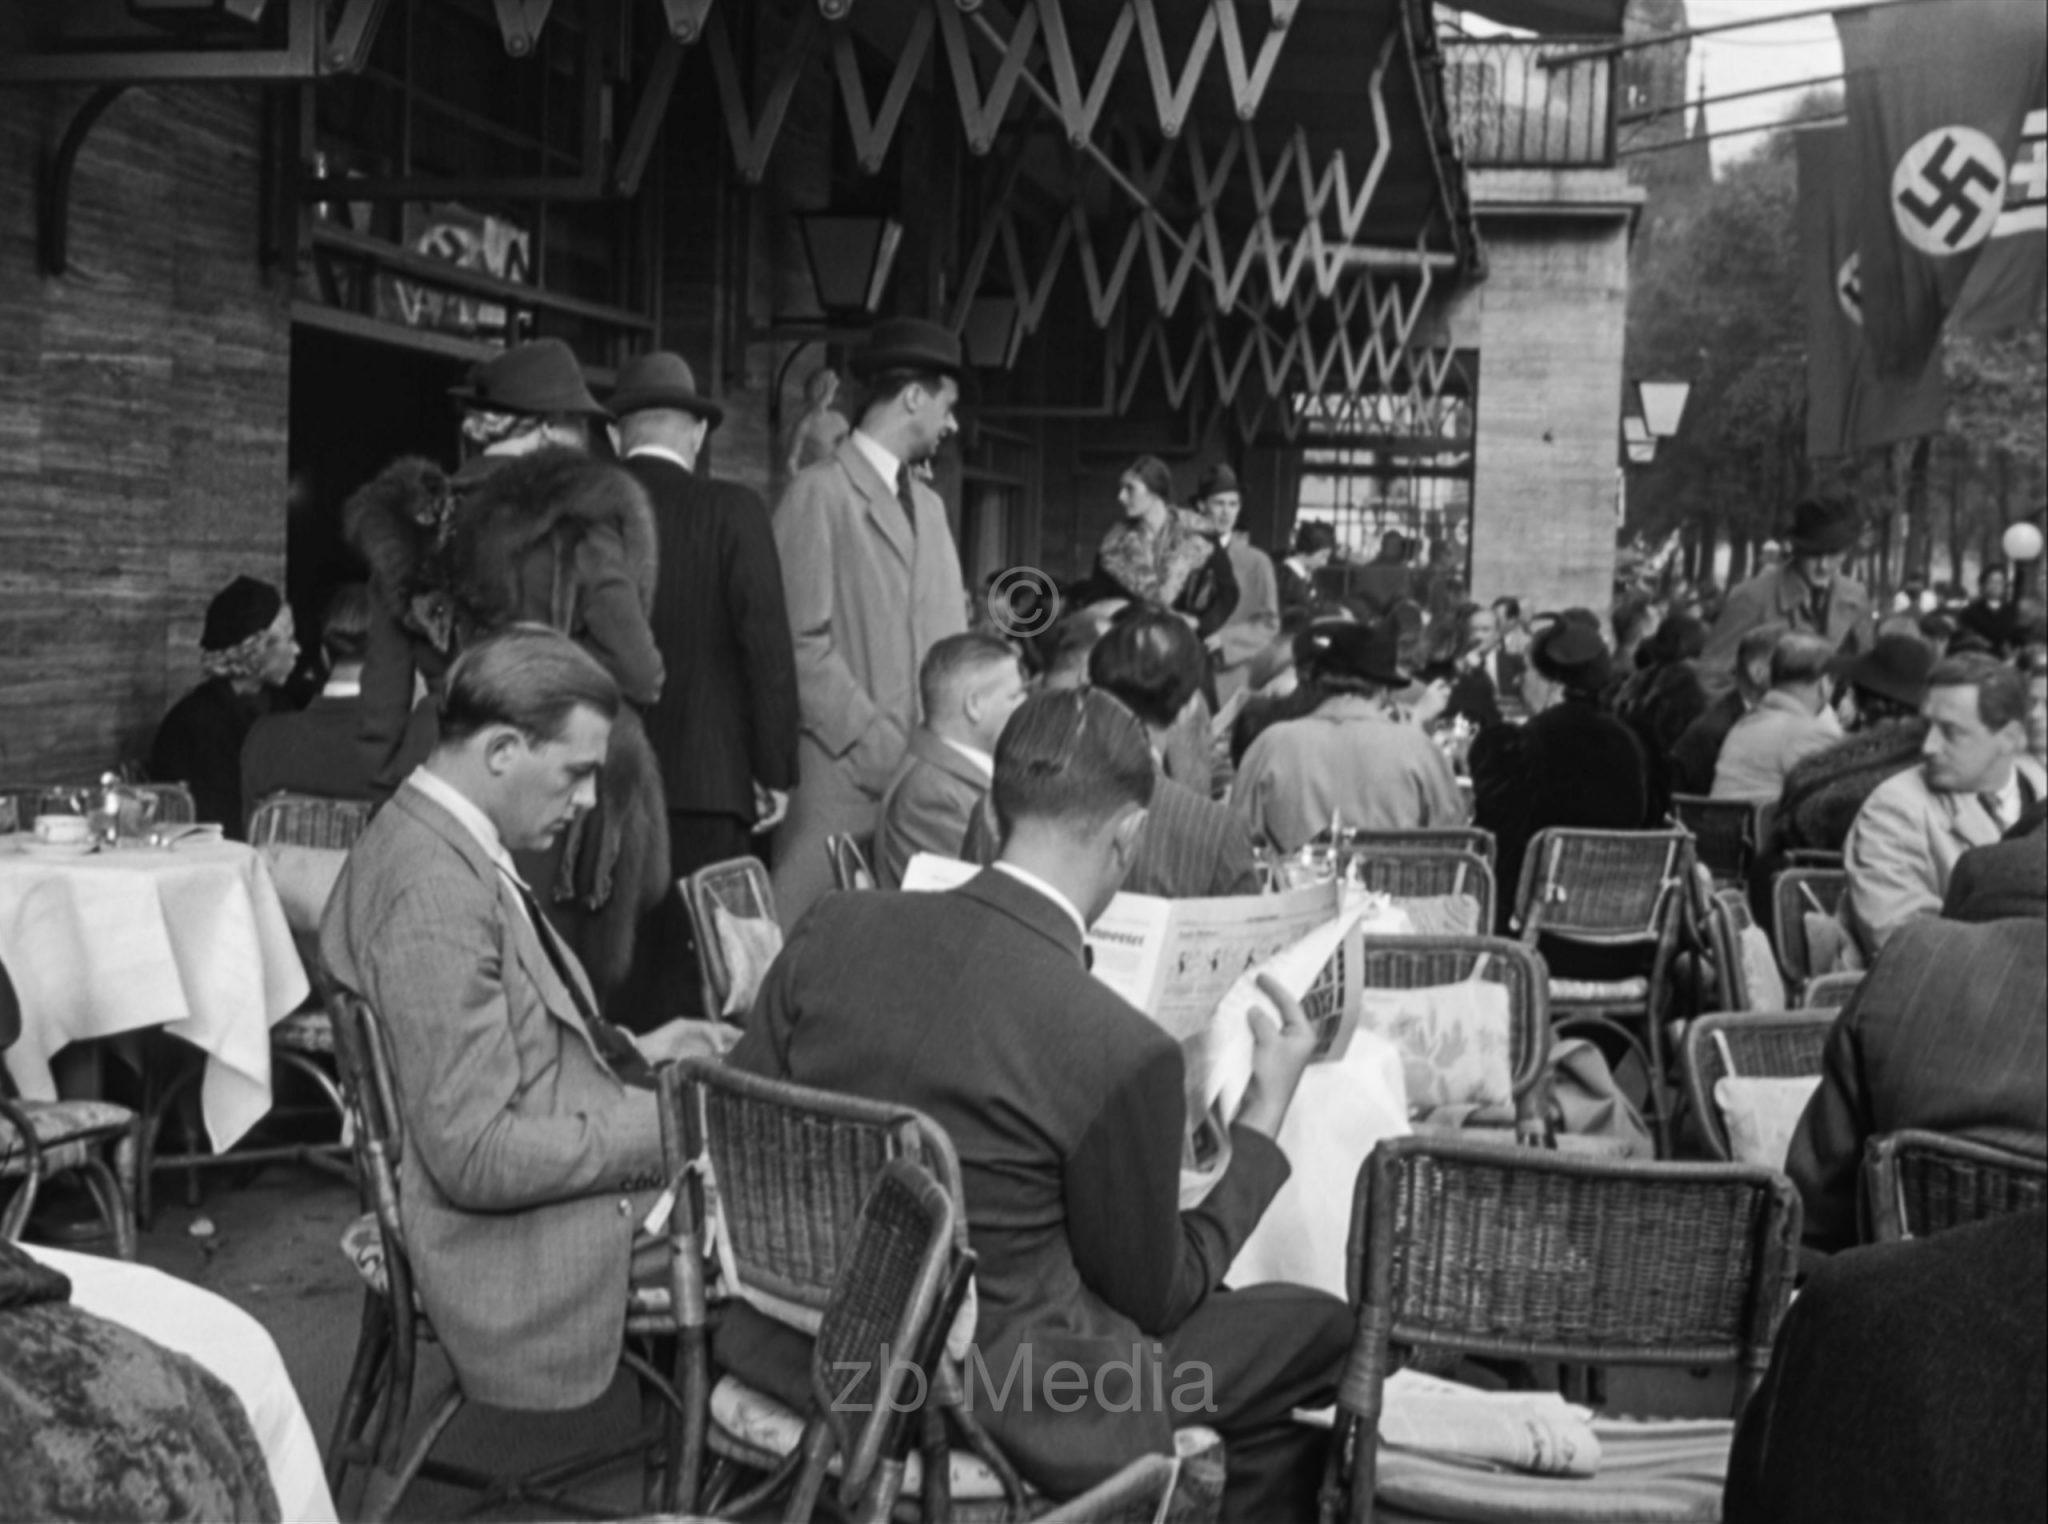 Deutschland 1937, Café Kranzler, Berlin